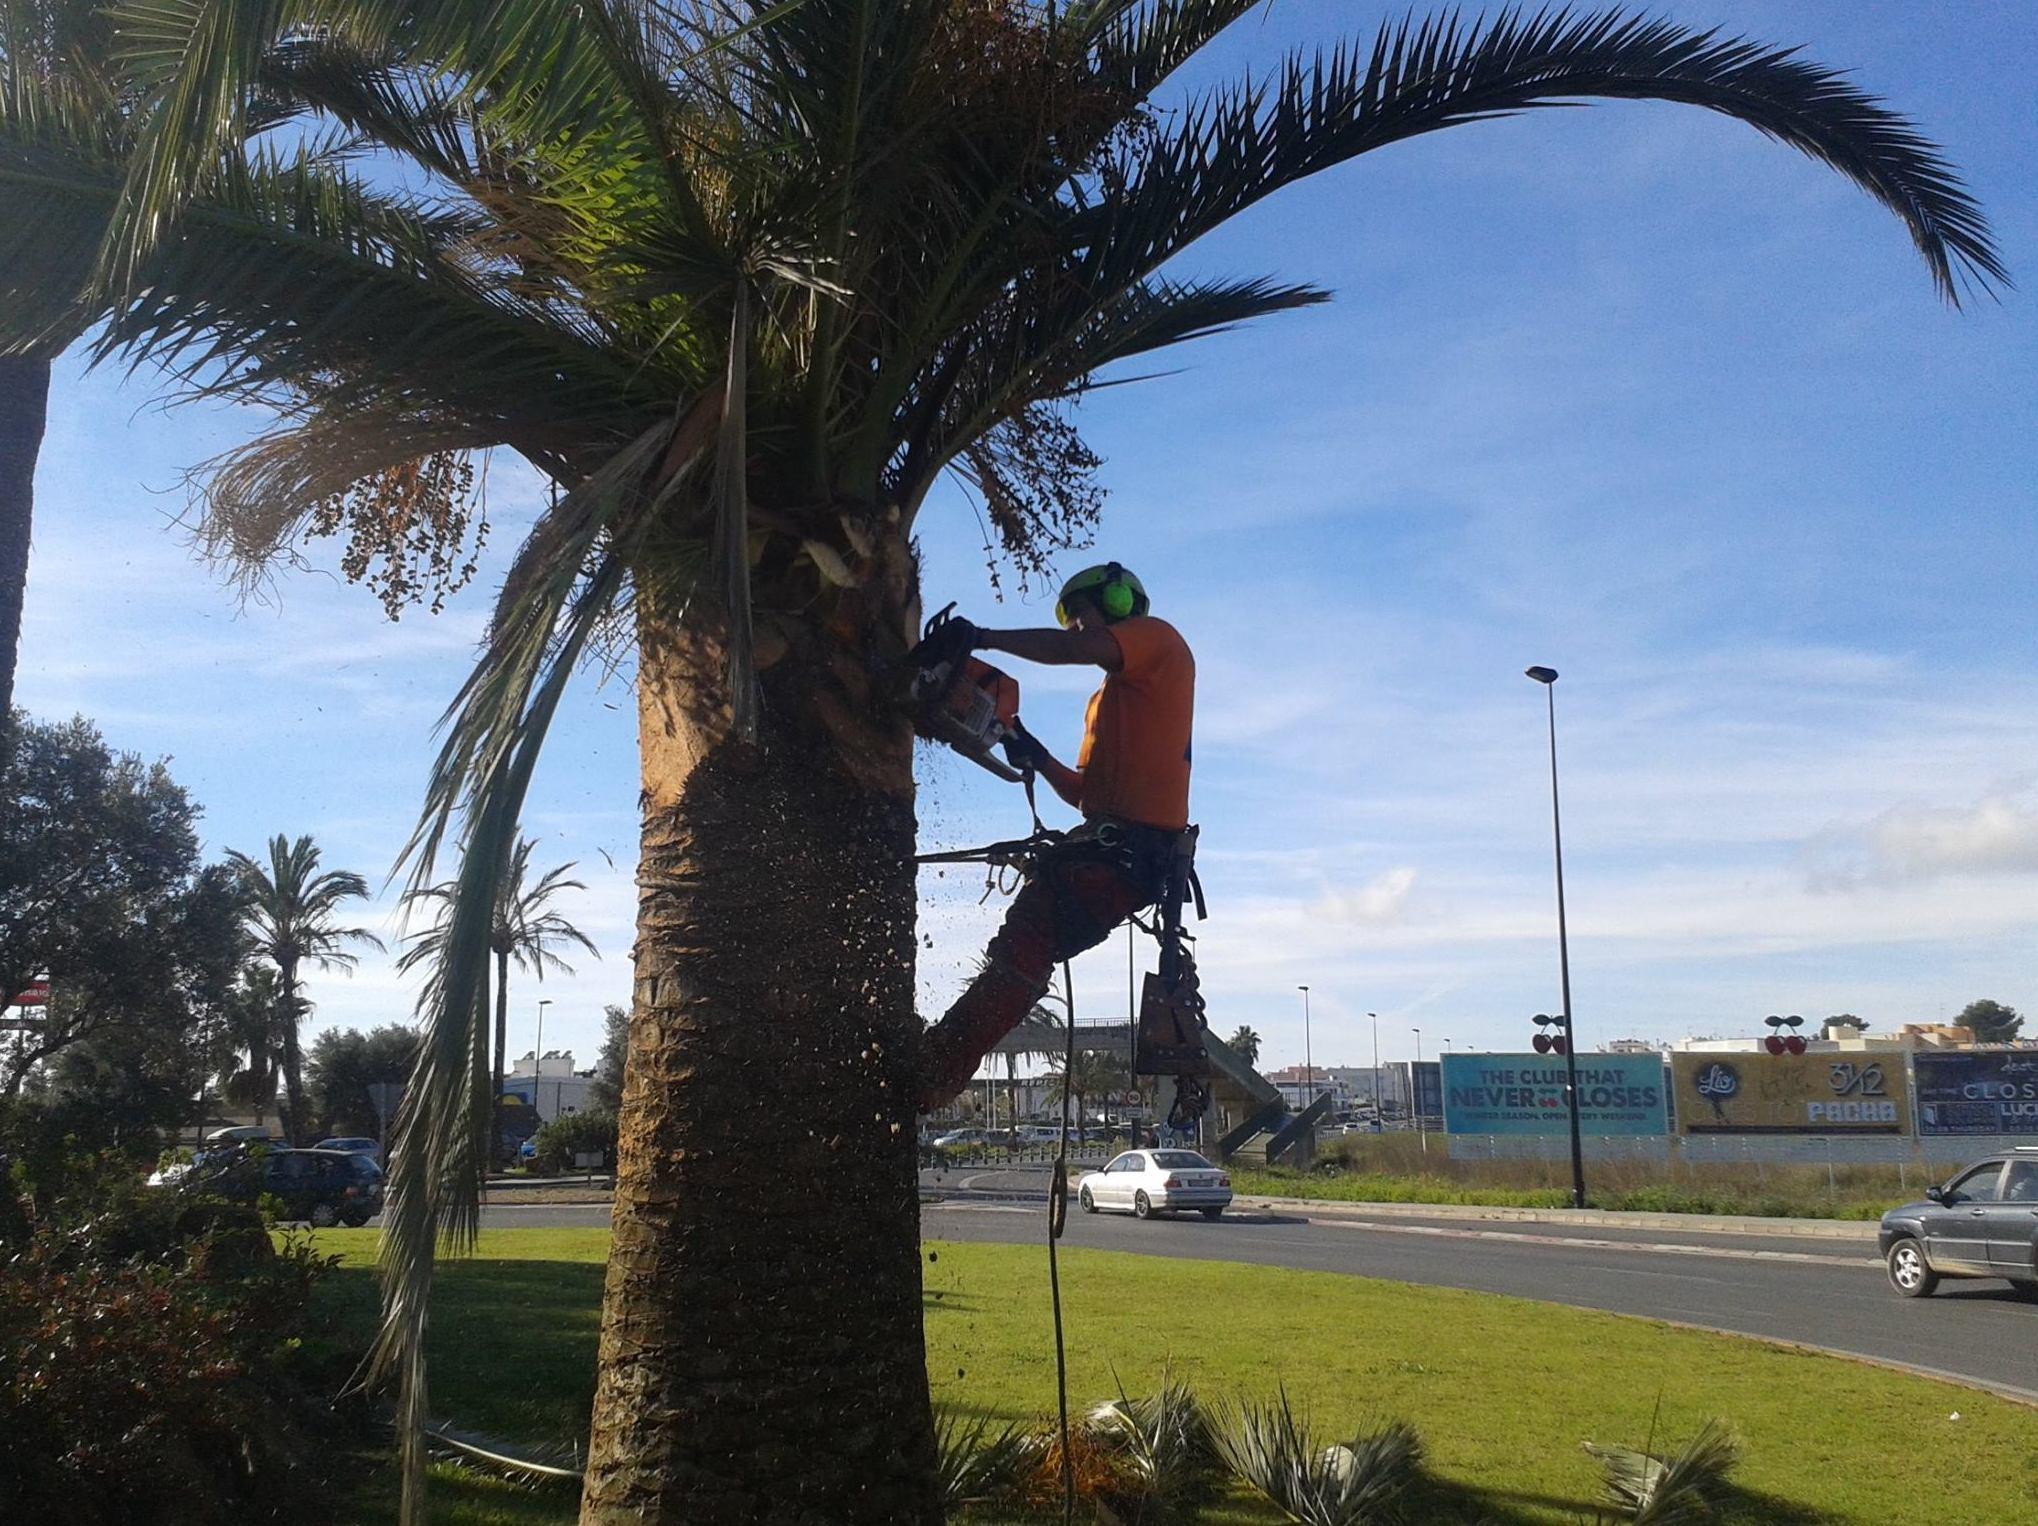 Cirugía o saneamiento en palmeras   : CATÁLOGO de Tamar Gardens